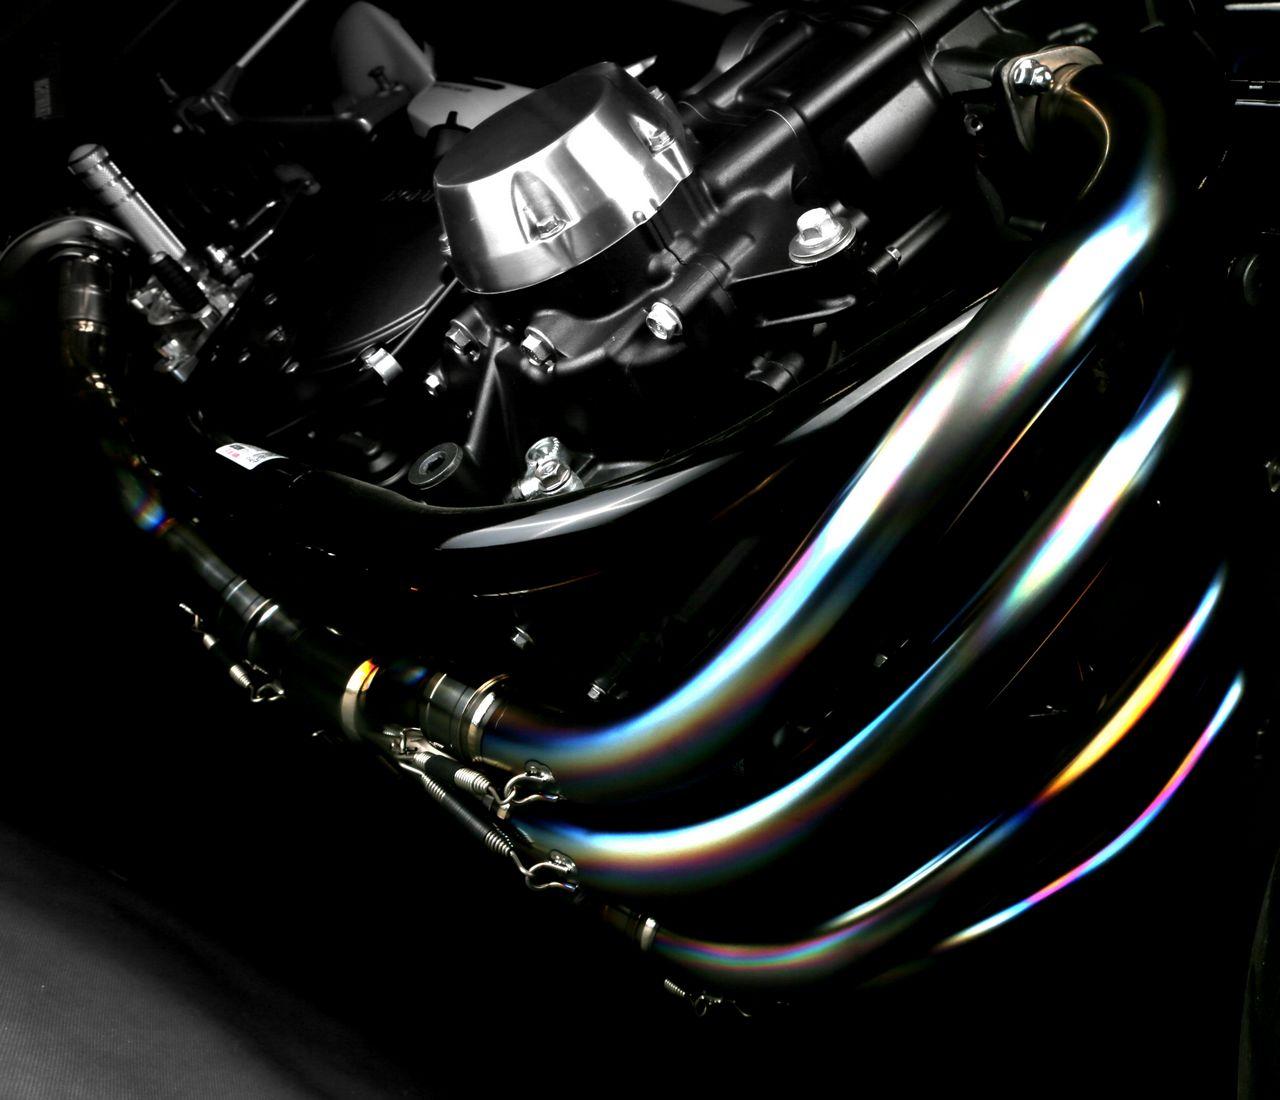 【MORIWAKI】MX REDLINE 全段排氣管 黑珍珠色 - 「Webike-摩托百貨」